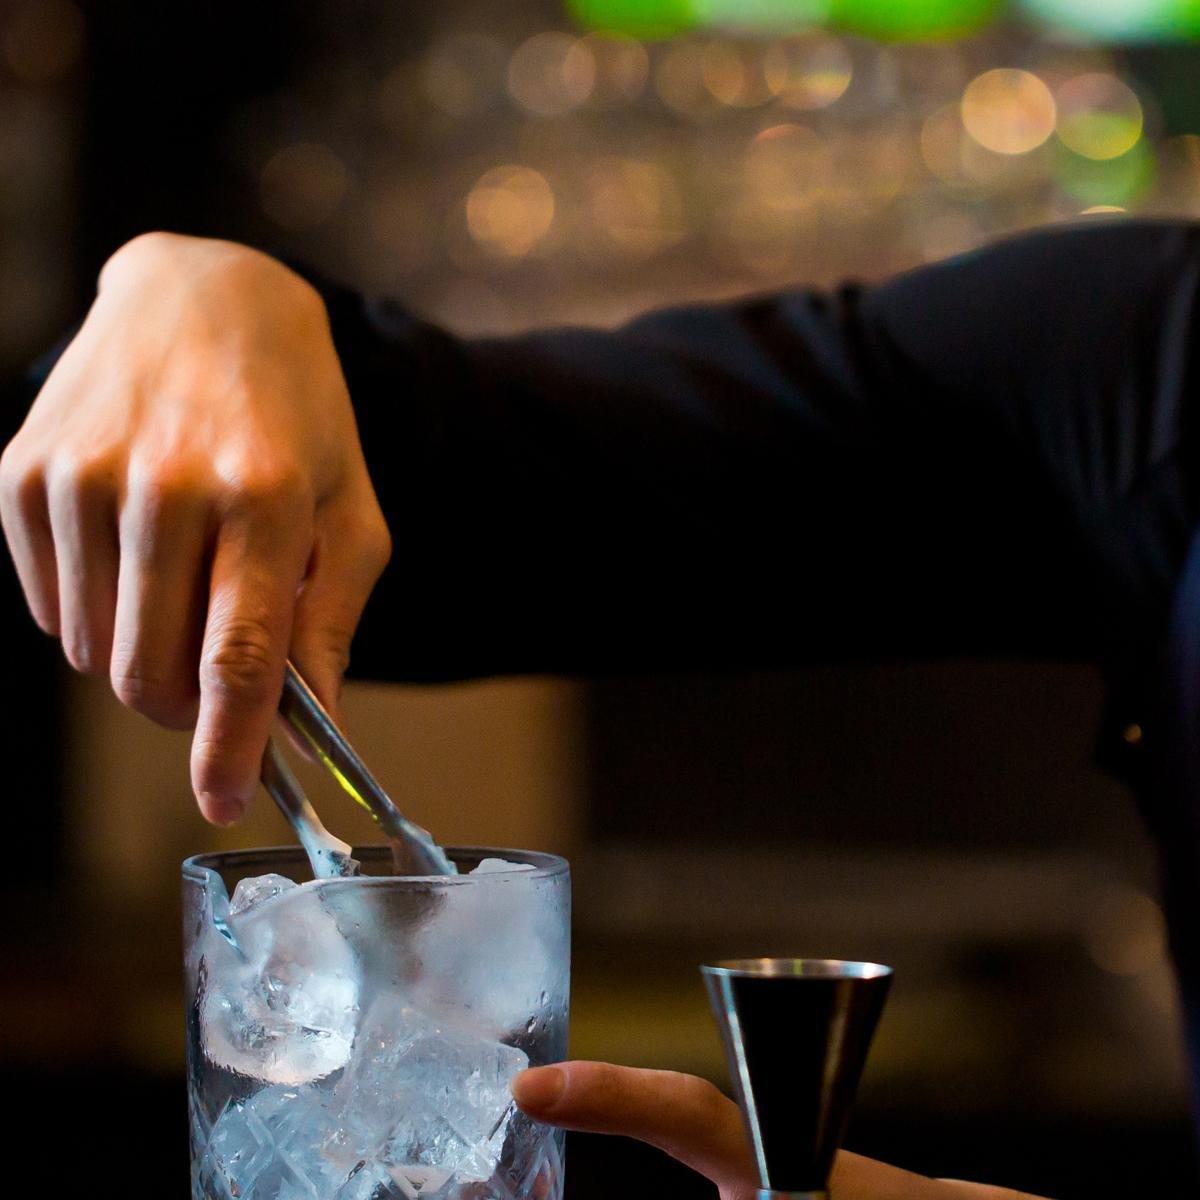 Compra FOONEE - Kit de Barra de coctelería de Acero Inoxidable, 19 oz, Base acrílica con fórmula de cóctel, Accesorios de Bar perfectos para un Carrito de ...